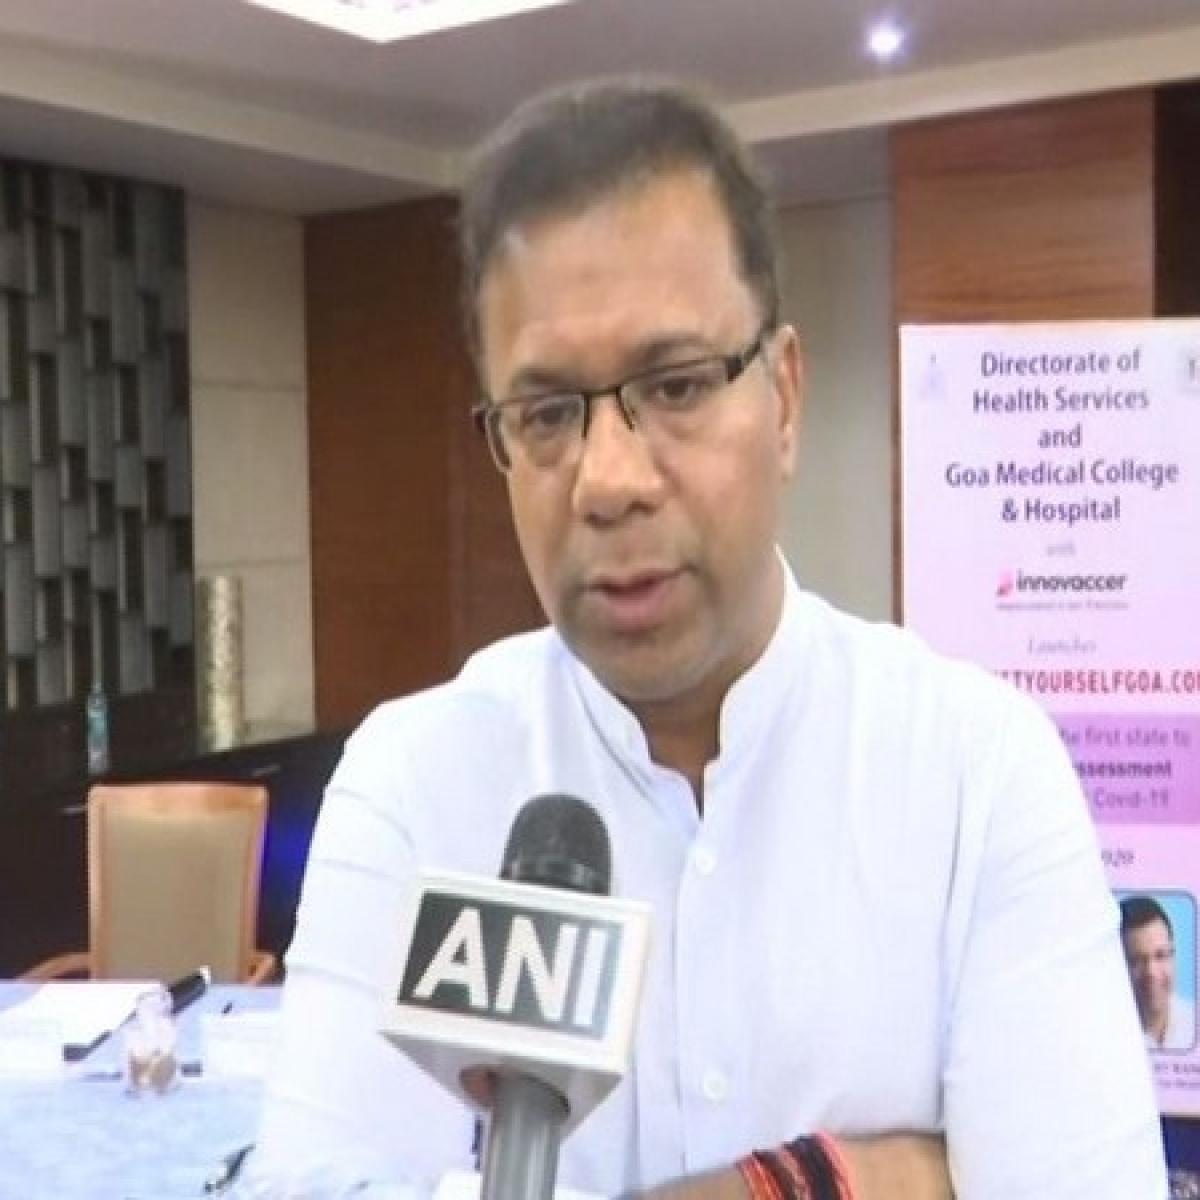 Latest coronavirus update: Goa's first COVID-19 patient recovers, says State Health Minister Vishwajit Rane